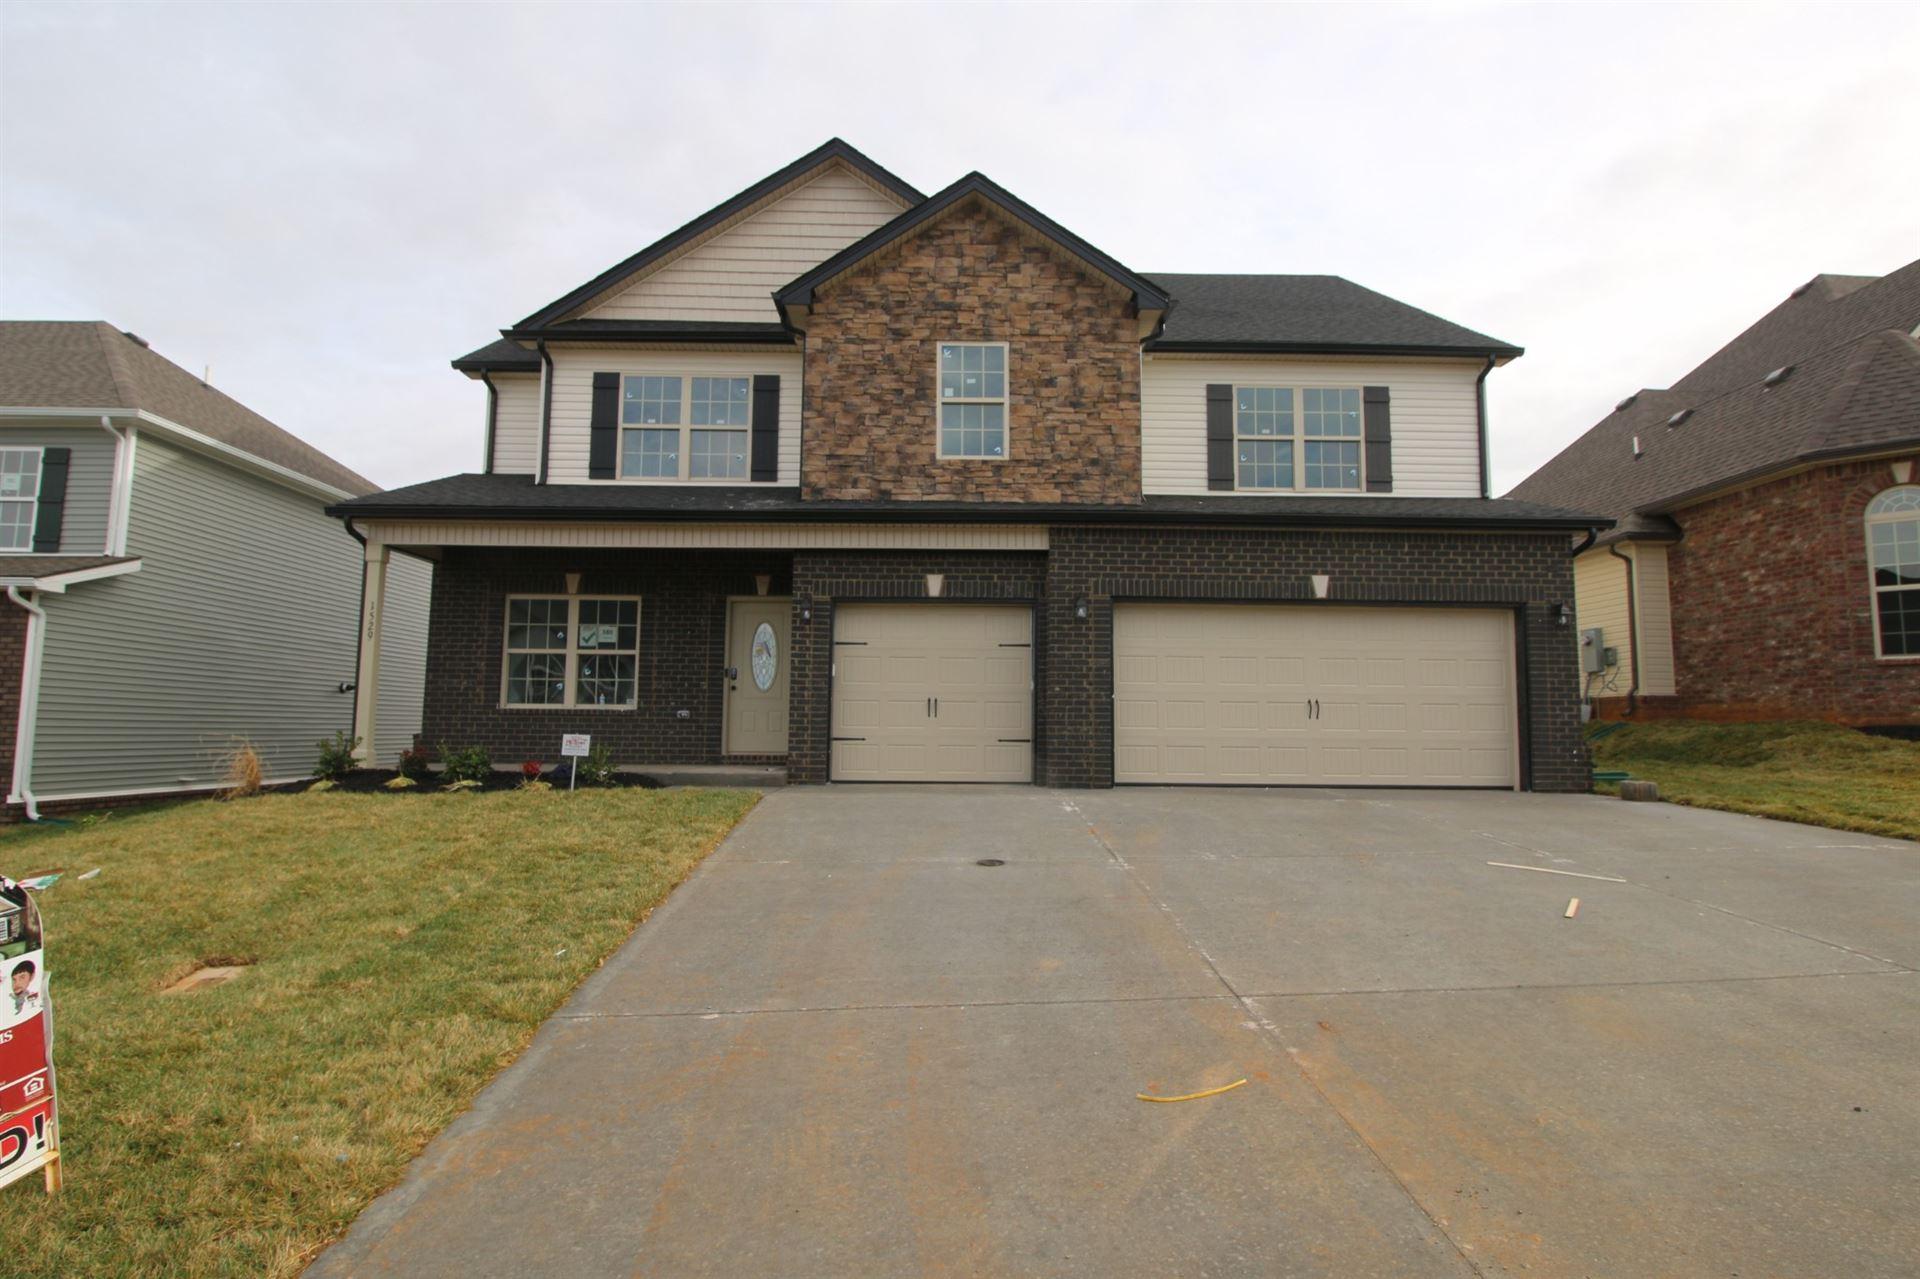 380 Summerfield, Clarksville, TN 37040 - MLS#: 2290040